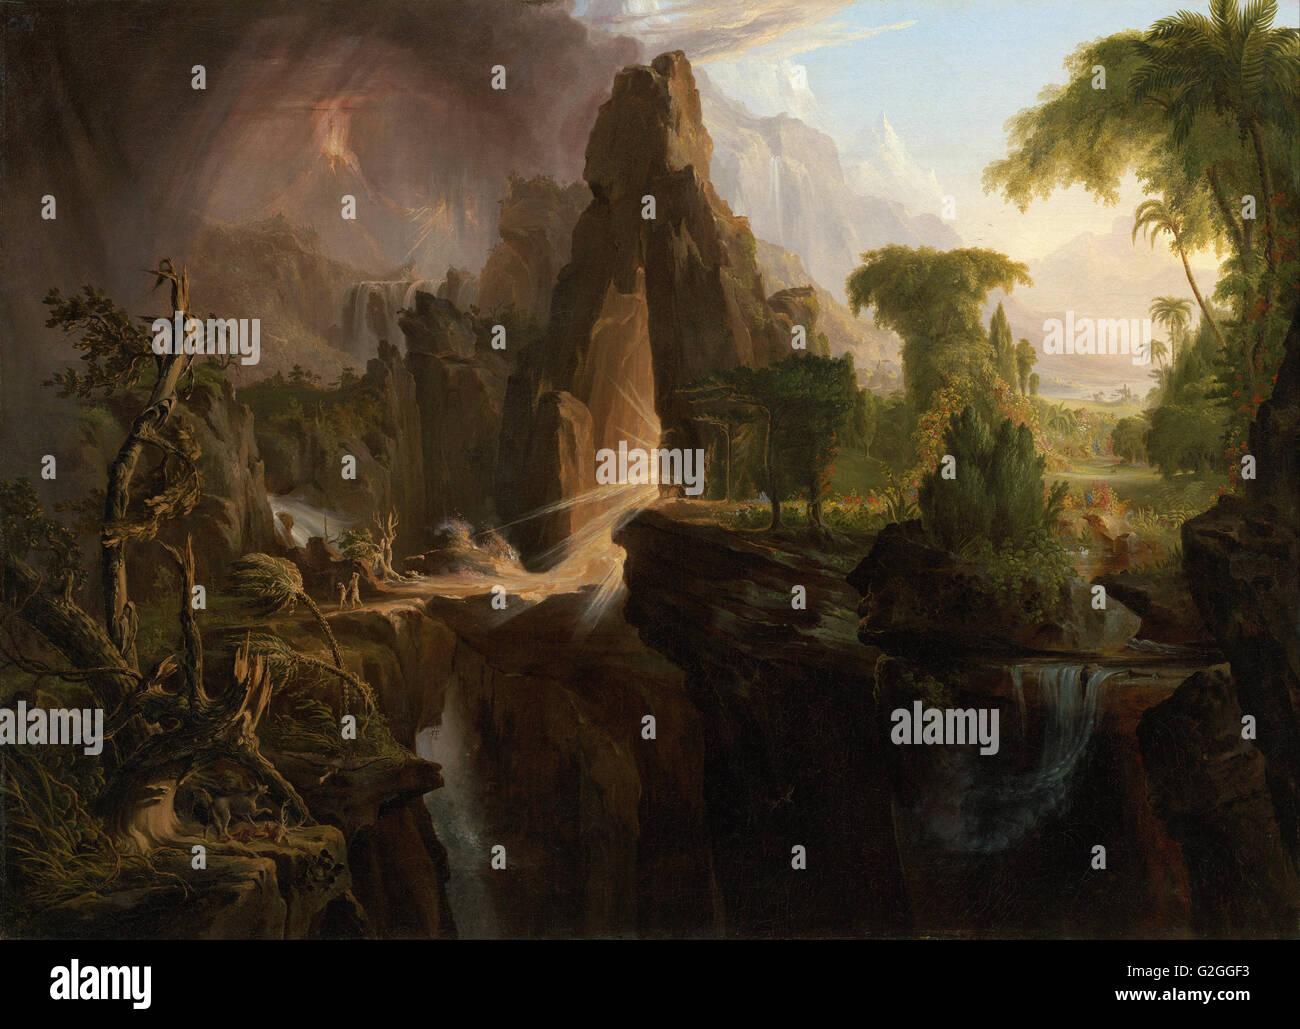 Thomas Cole - Expulsion from the Garden of Eden - Museum of Fine Arts, Boston - Stock Image